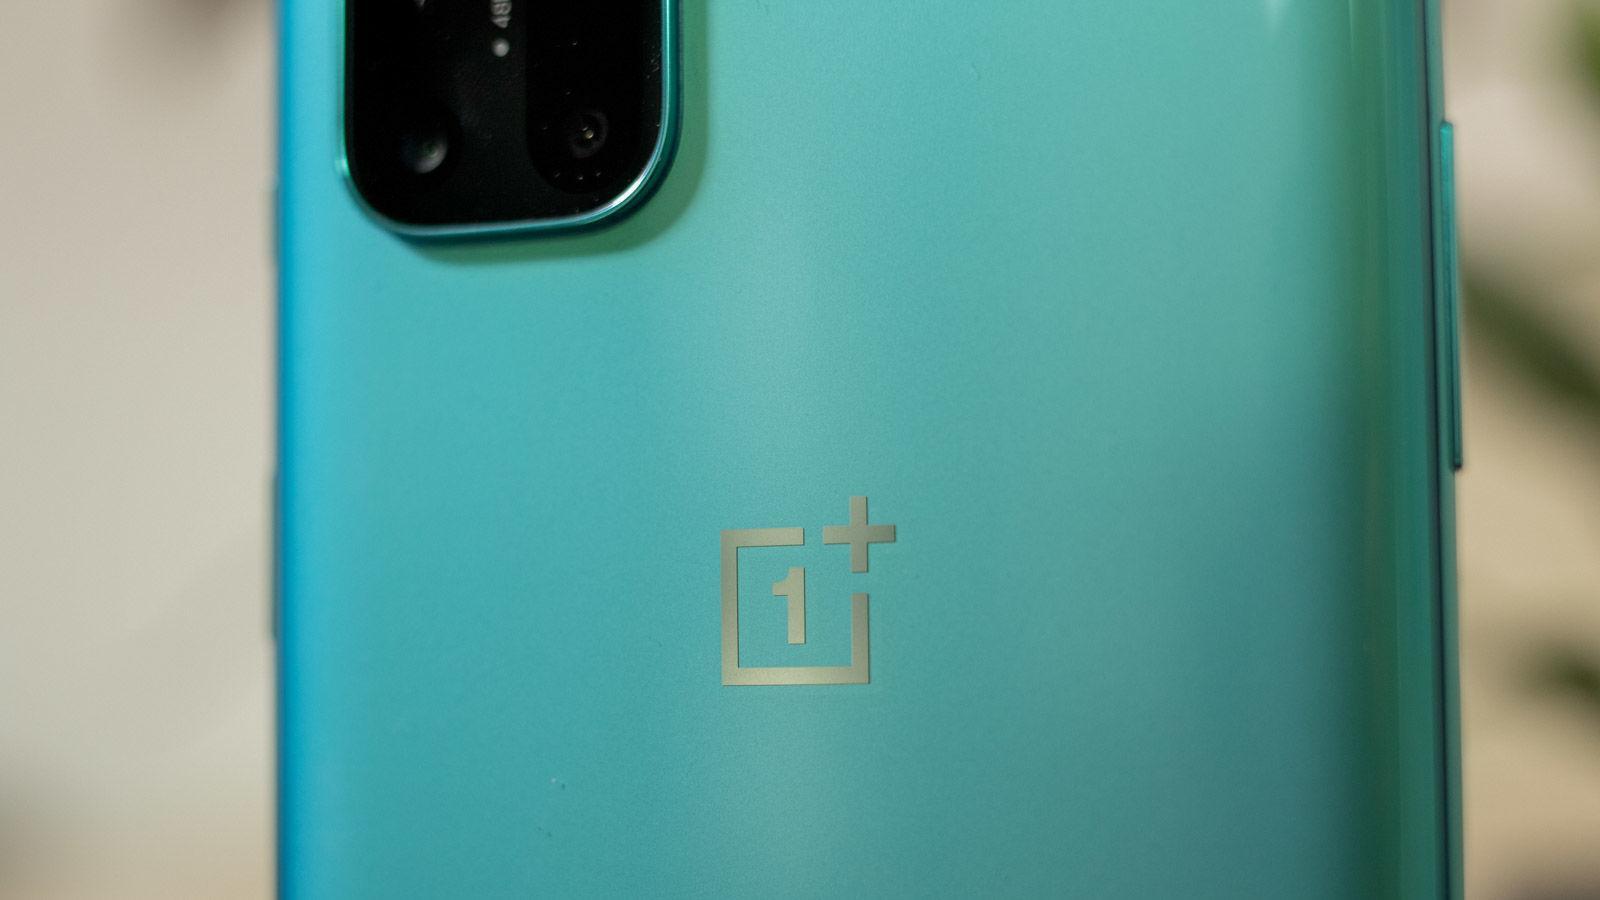 OnePlus 8T logo